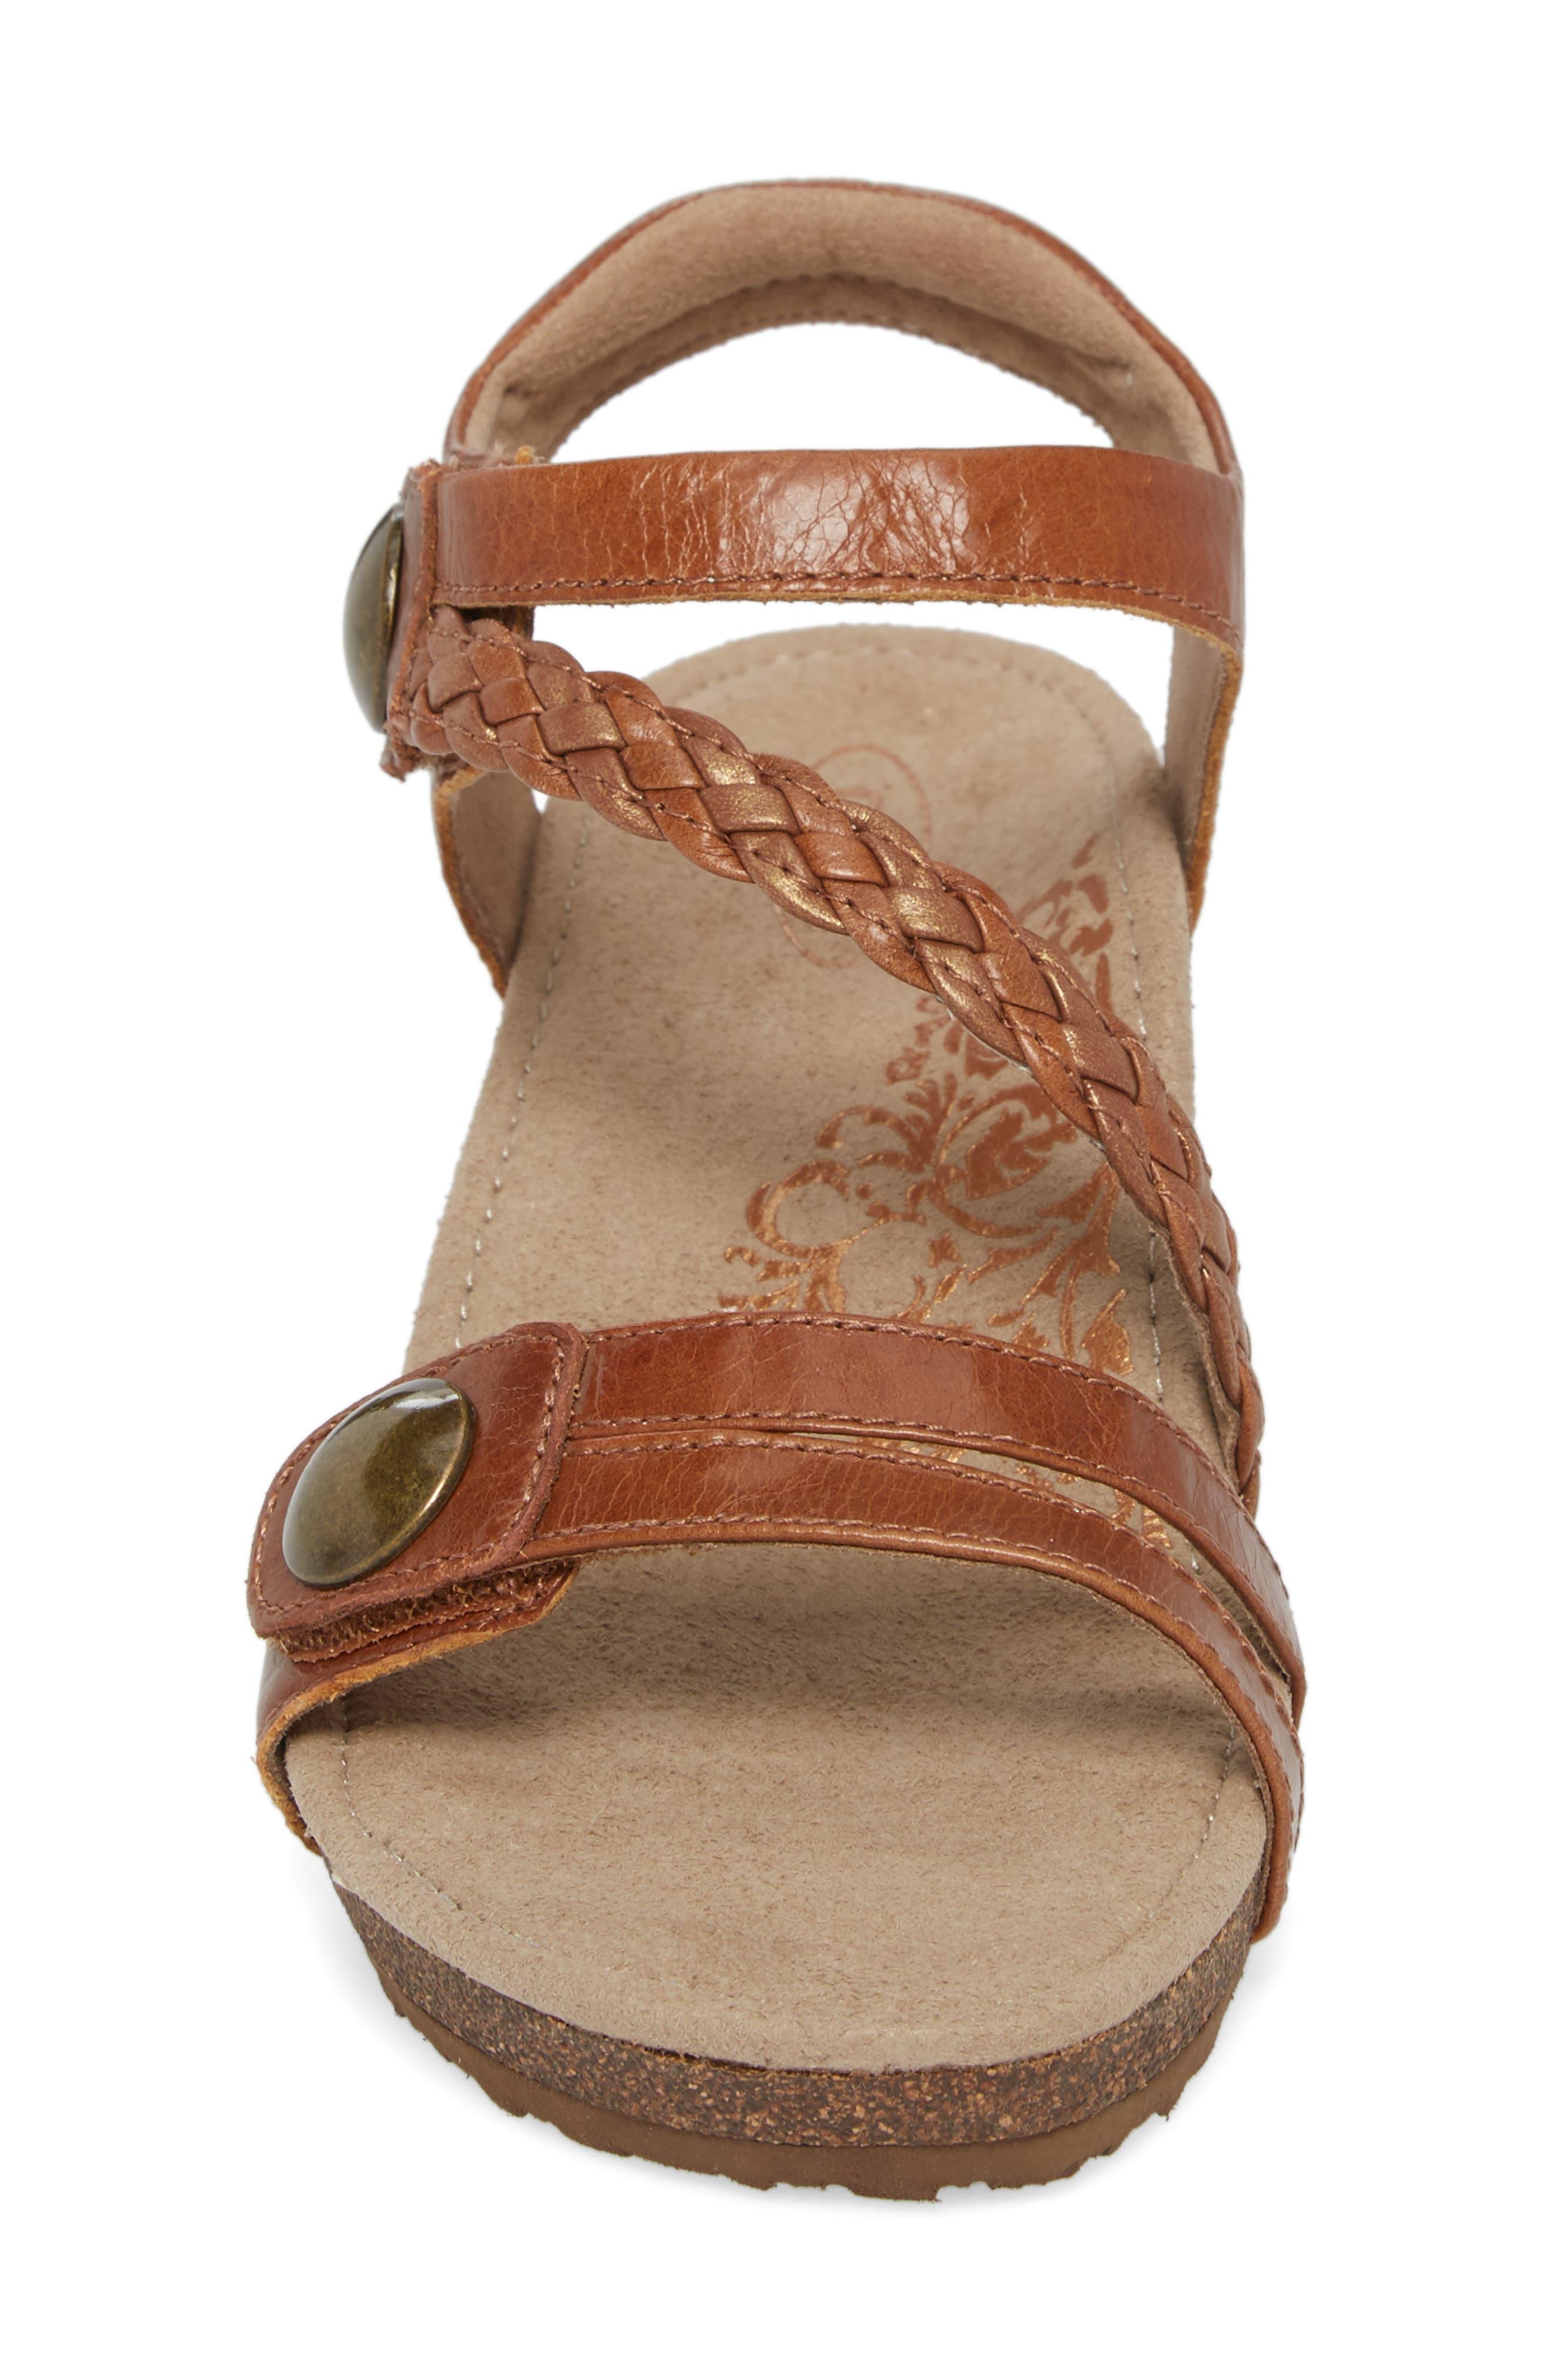 'Naya' Wedge Sandal,                             Alternate thumbnail 4, color,                             Cognac Leather